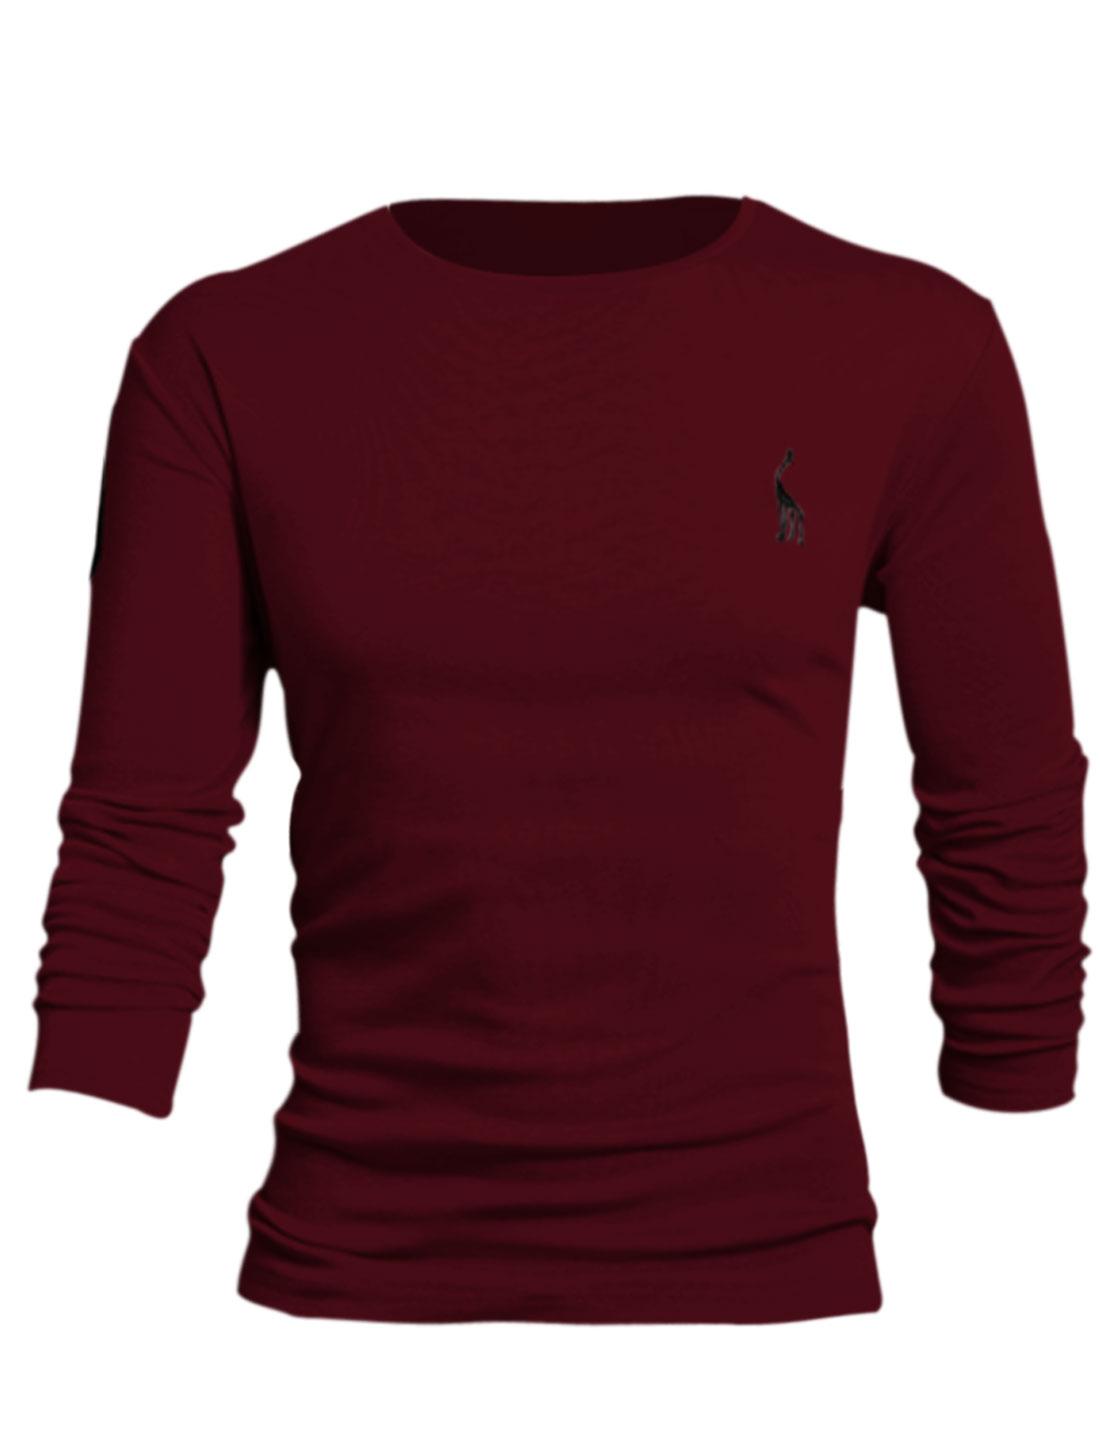 Men Deer Embroidery Slipover Design Stylish Style Tee Shirt Burgundy L